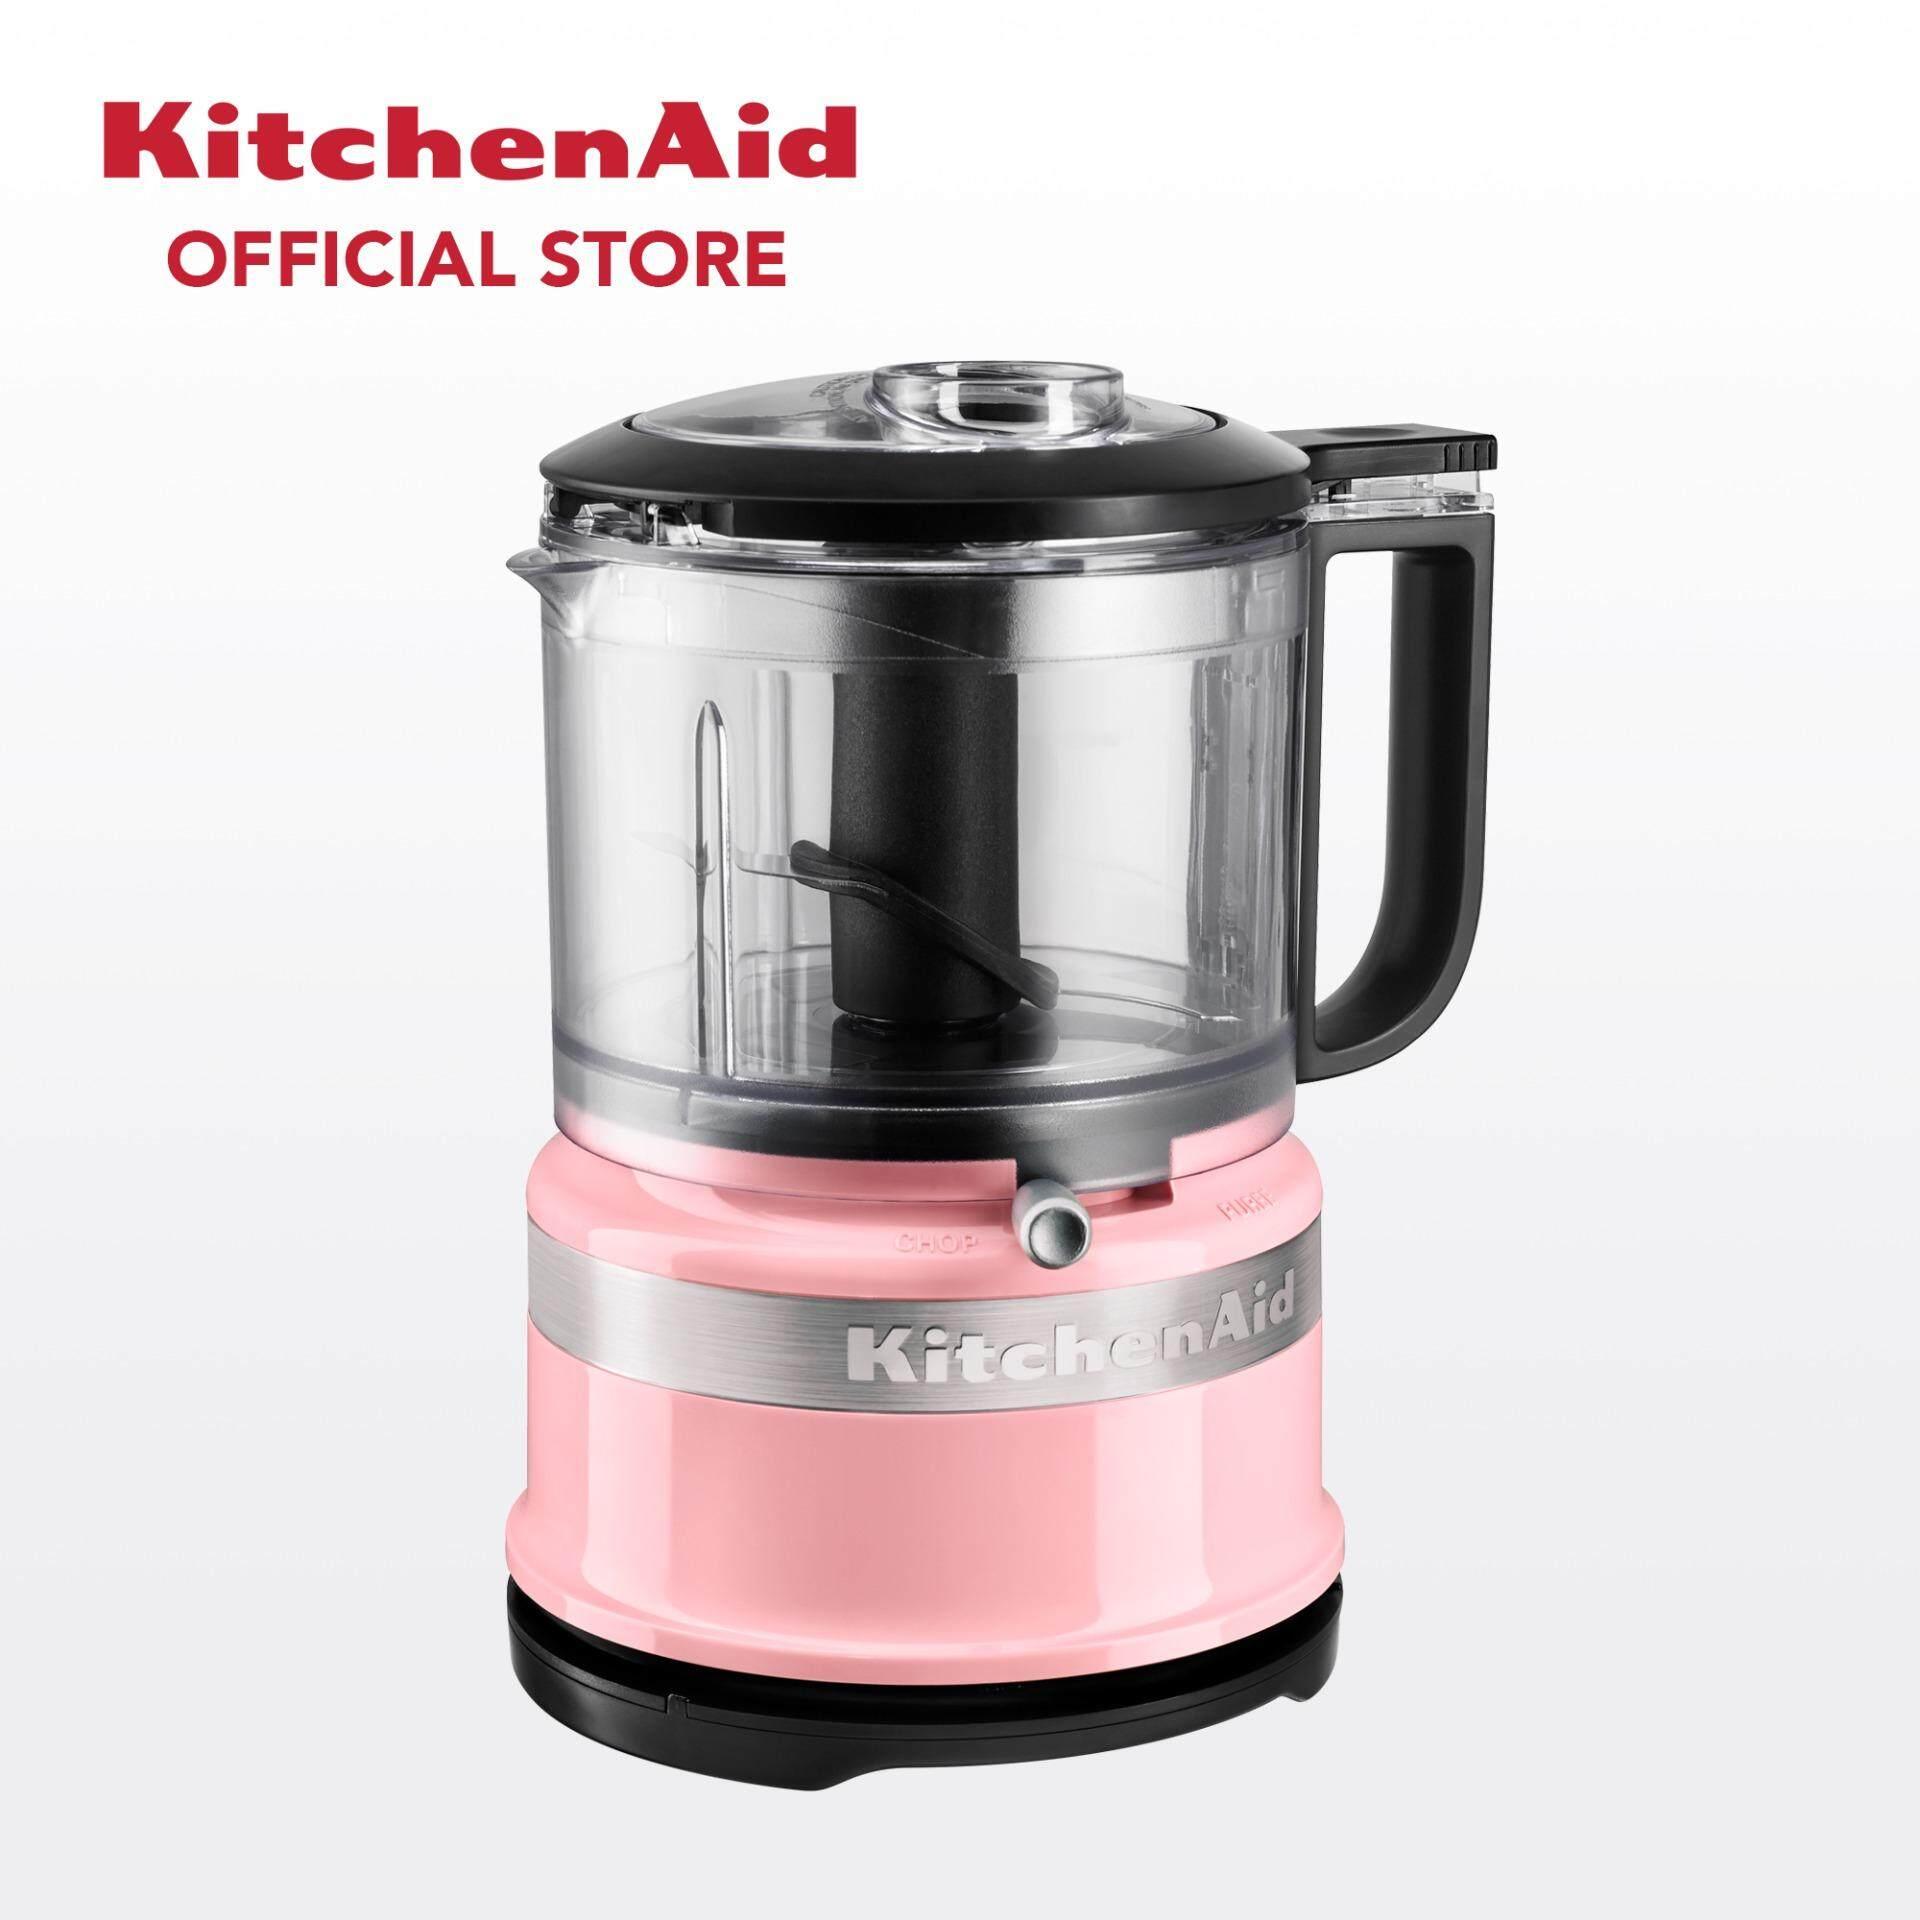 Kitchenaid 3 5 Cup Food Chopper 5kfc3516bgu Garnet